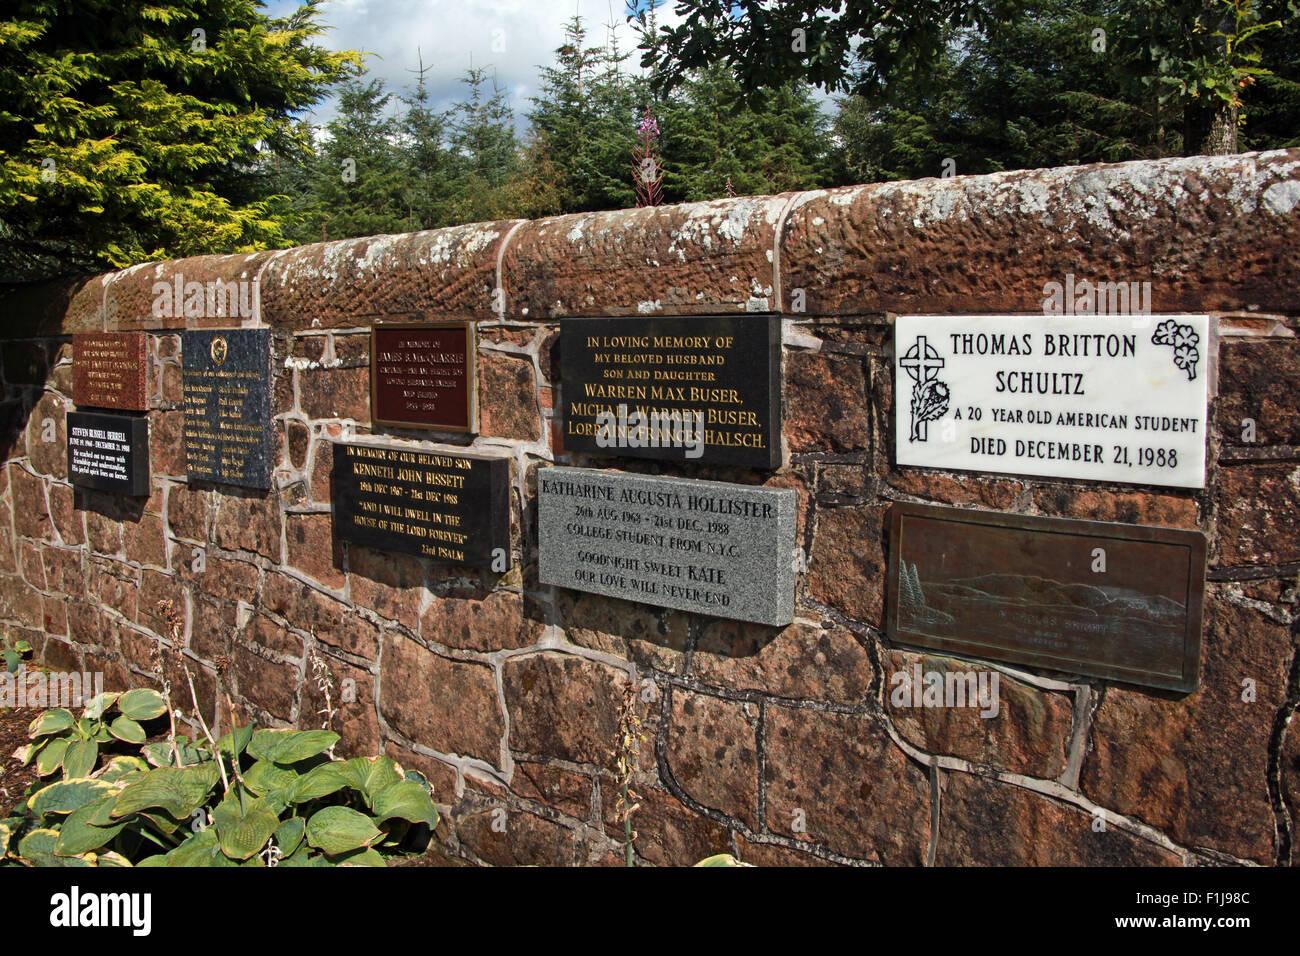 Lockerbie PanAm103 In Rememberance Memorial Wall Thomas Britton Schultz,Scotland Stock Photo